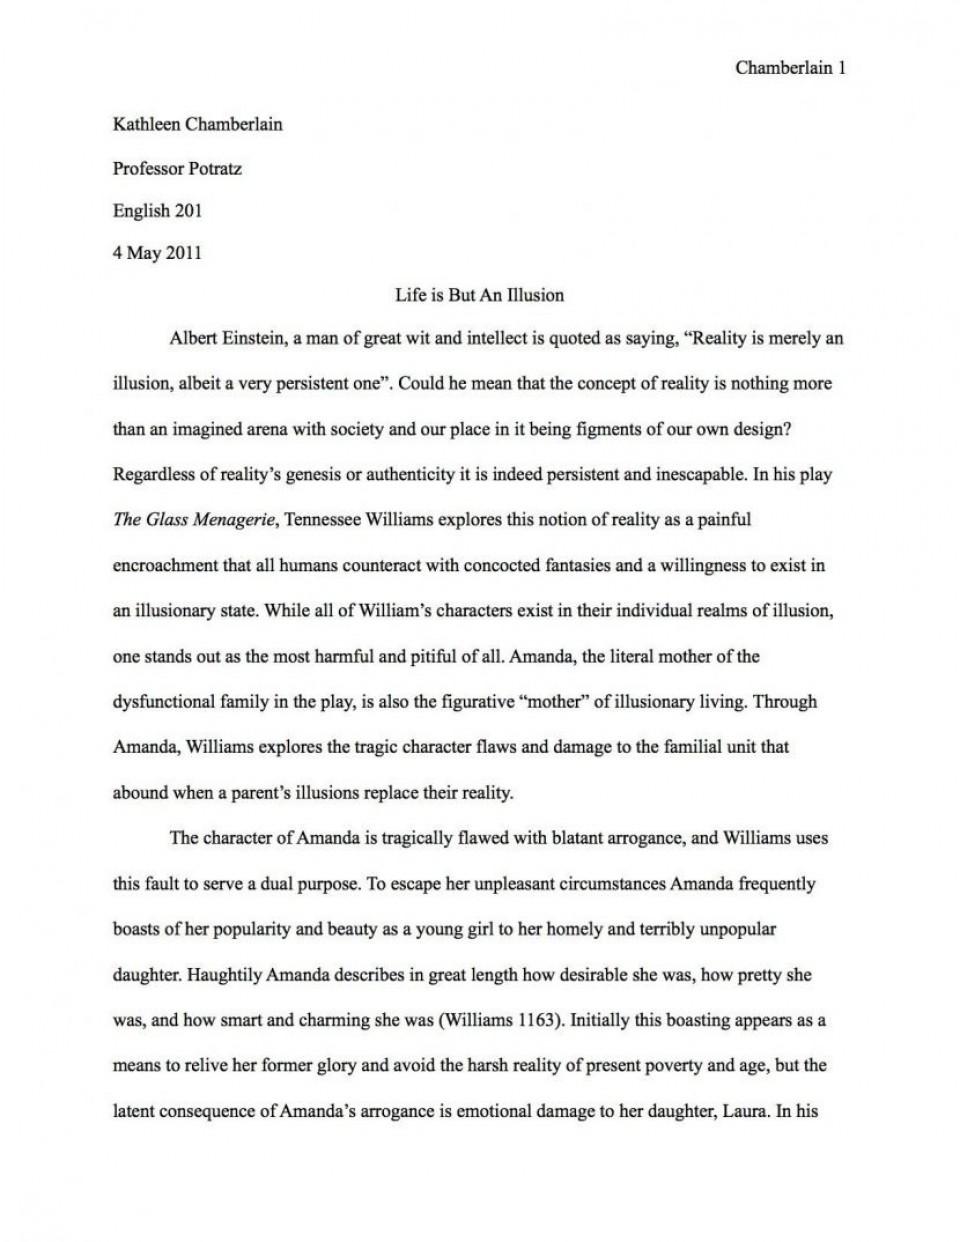 Open campus essay